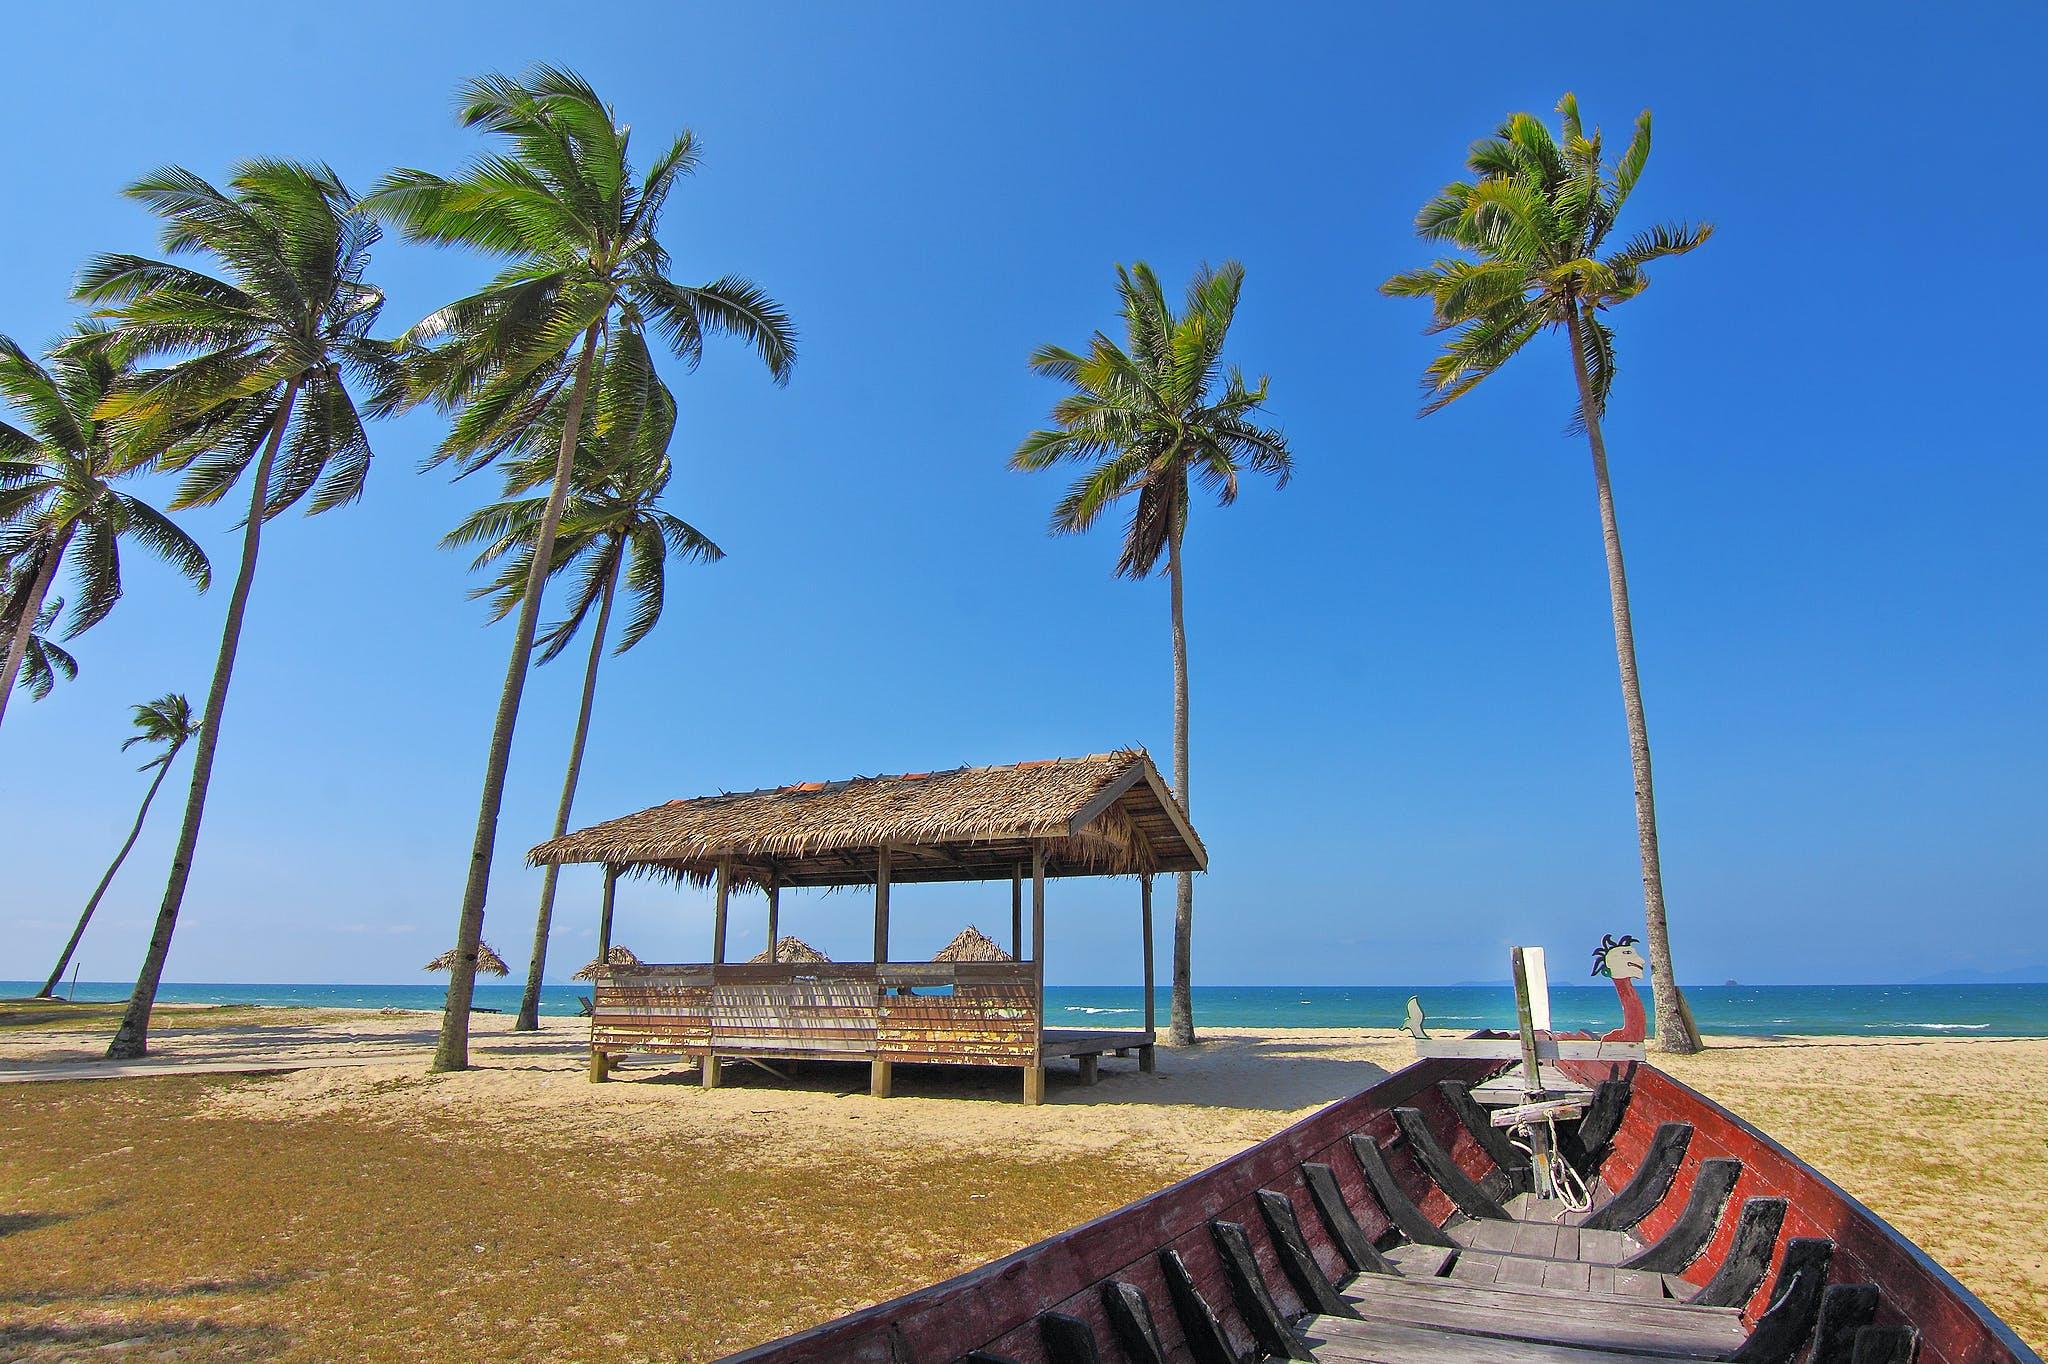 Red Boat Facing Palm Trees Near the Seashore